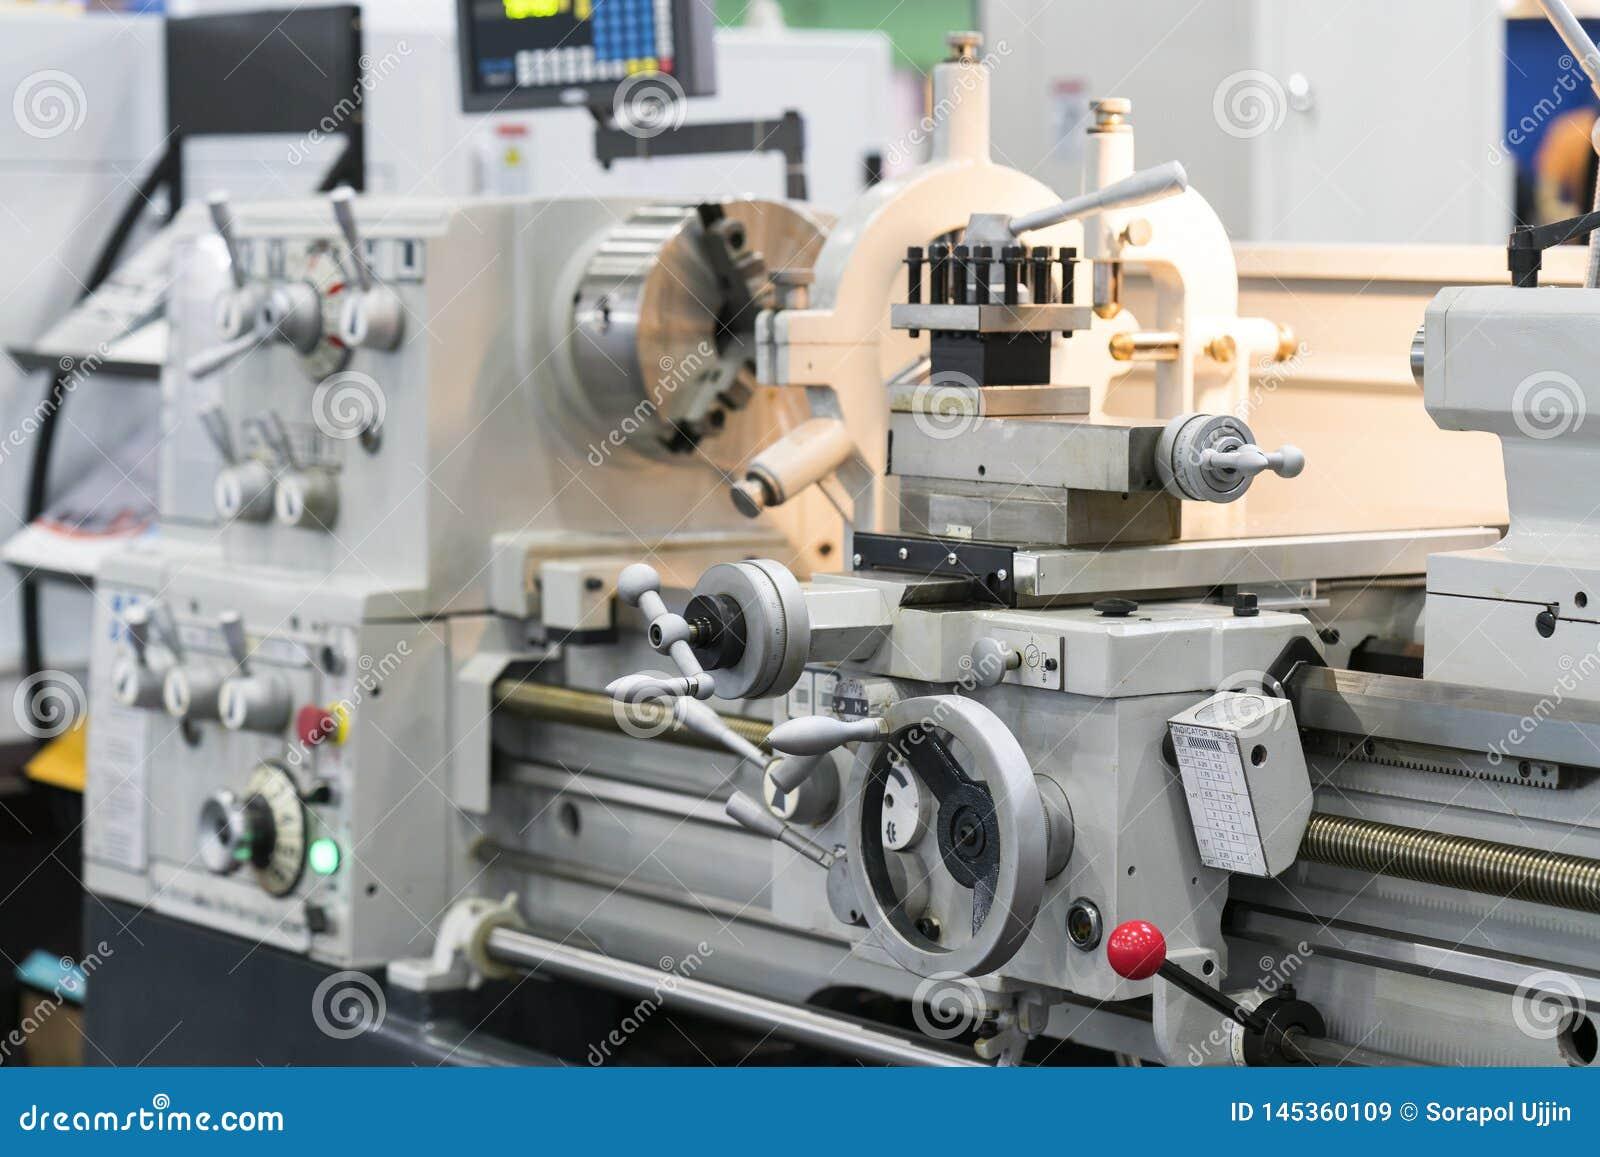 High Precision Manual Lathe Machine Stock Image Manual Guide